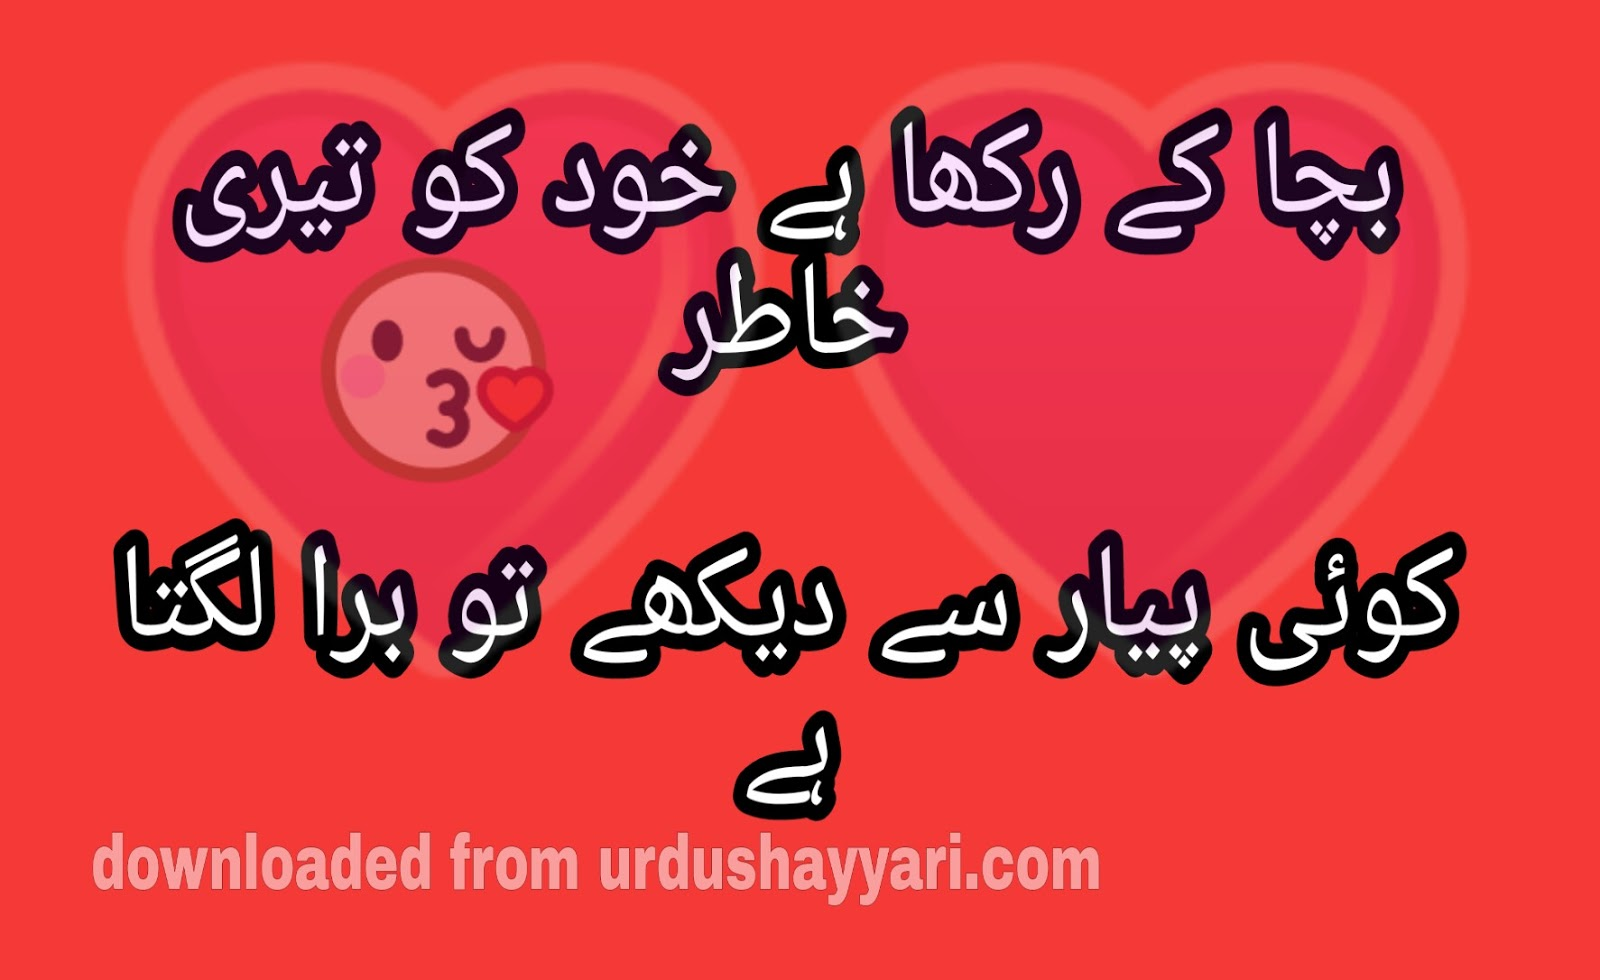 Urdu shayari love - Urdu shayari